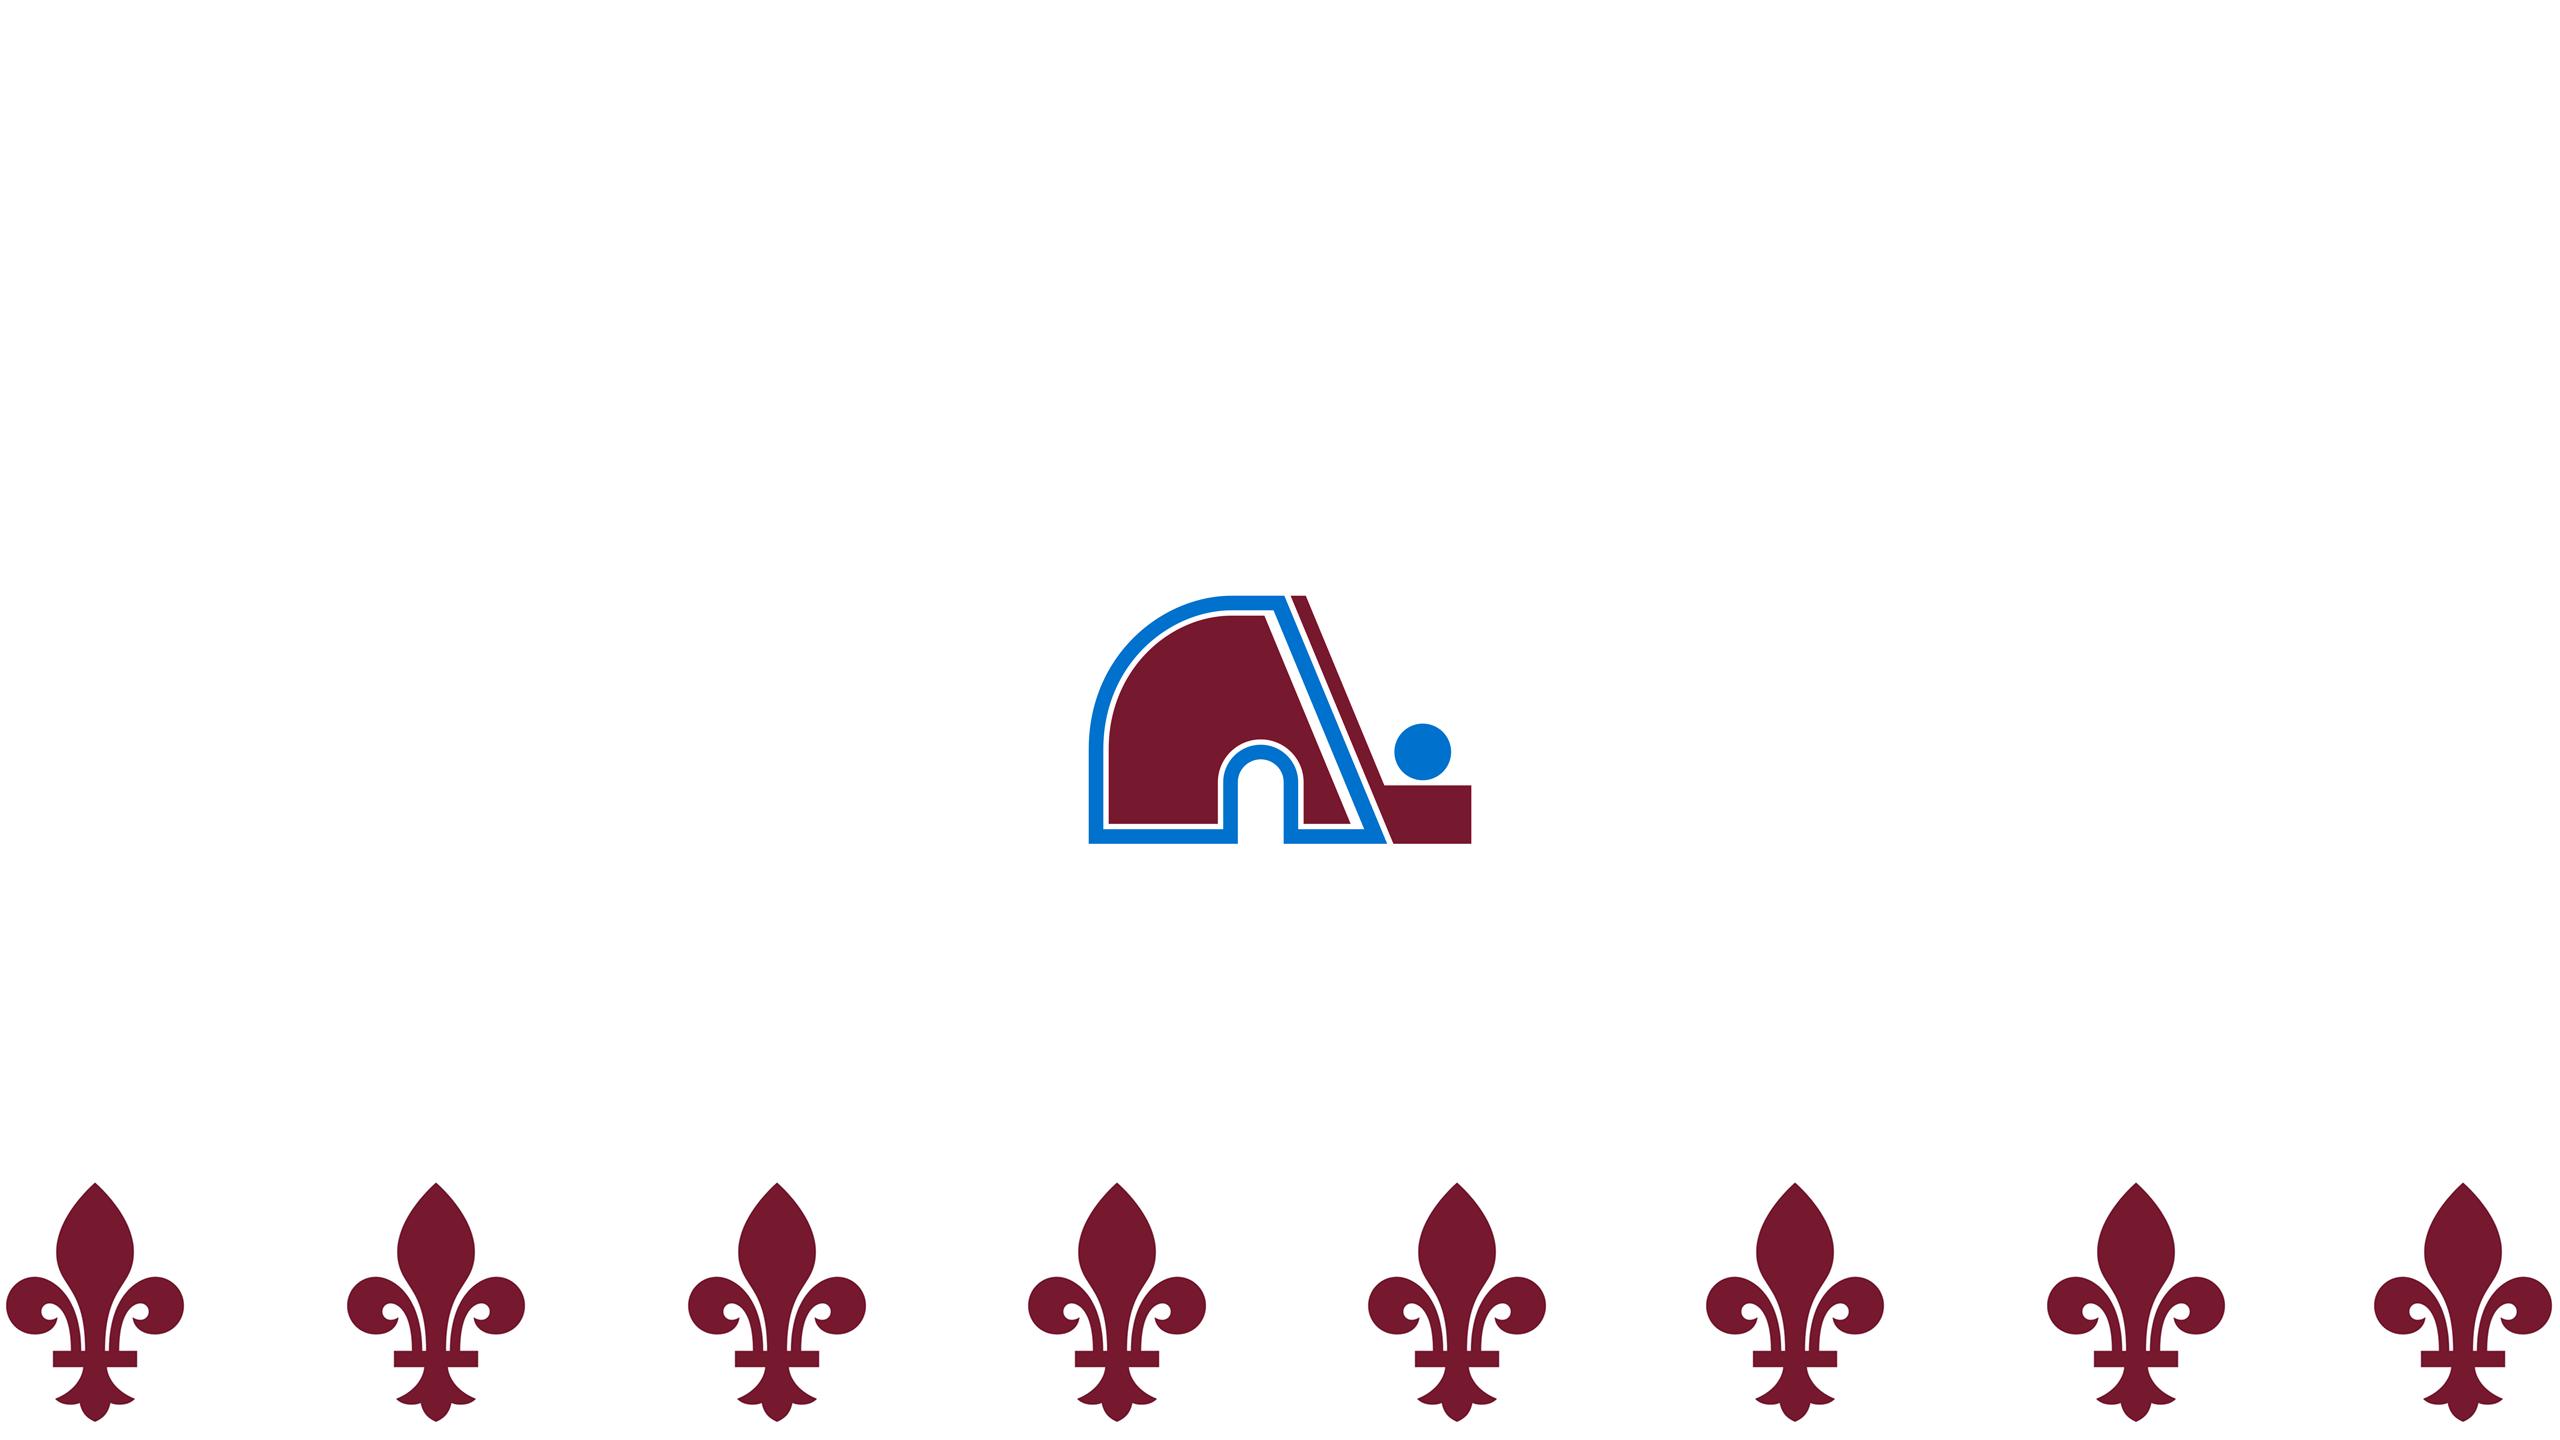 Colorado Avalanche (Quebec Nordiques)